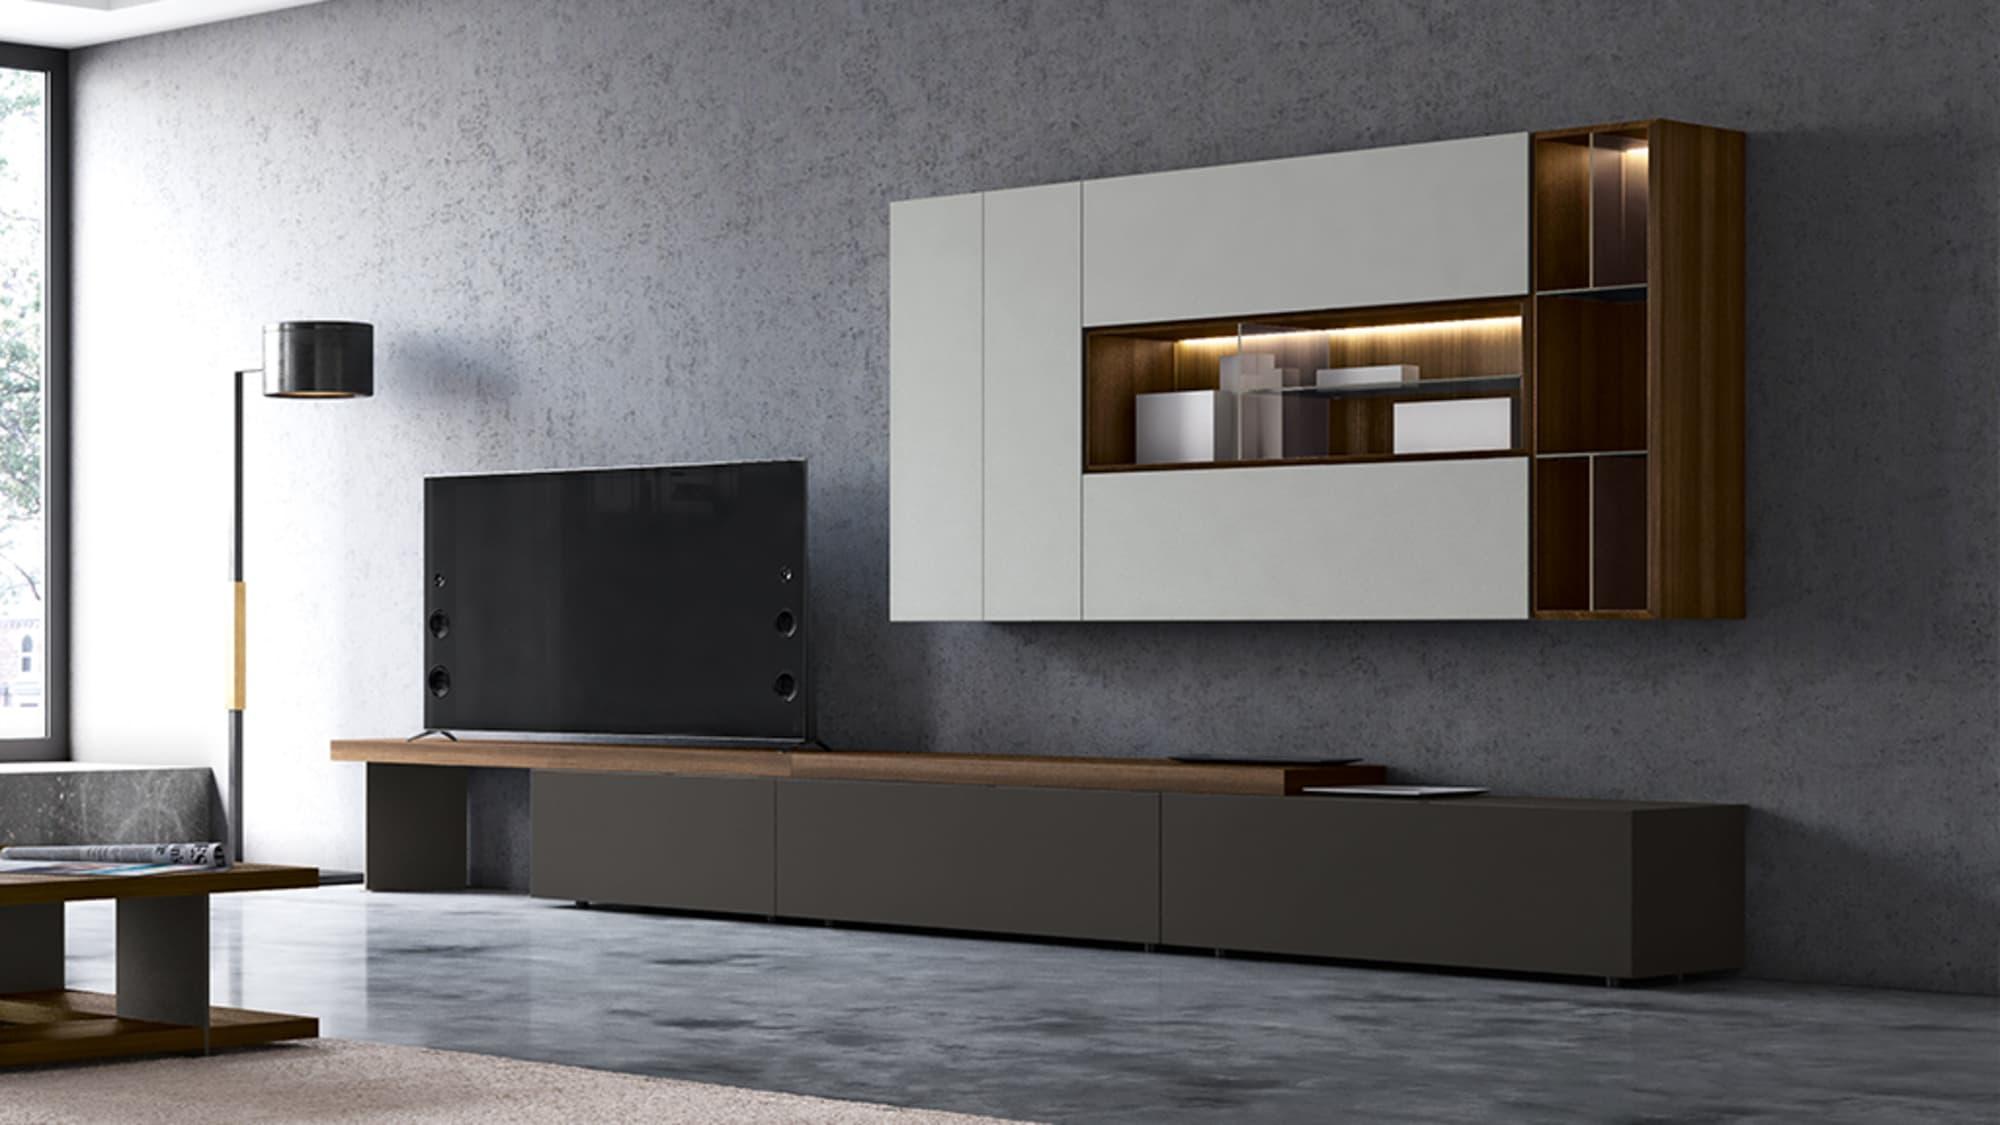 Living Room in abbinamento con cucina Kore